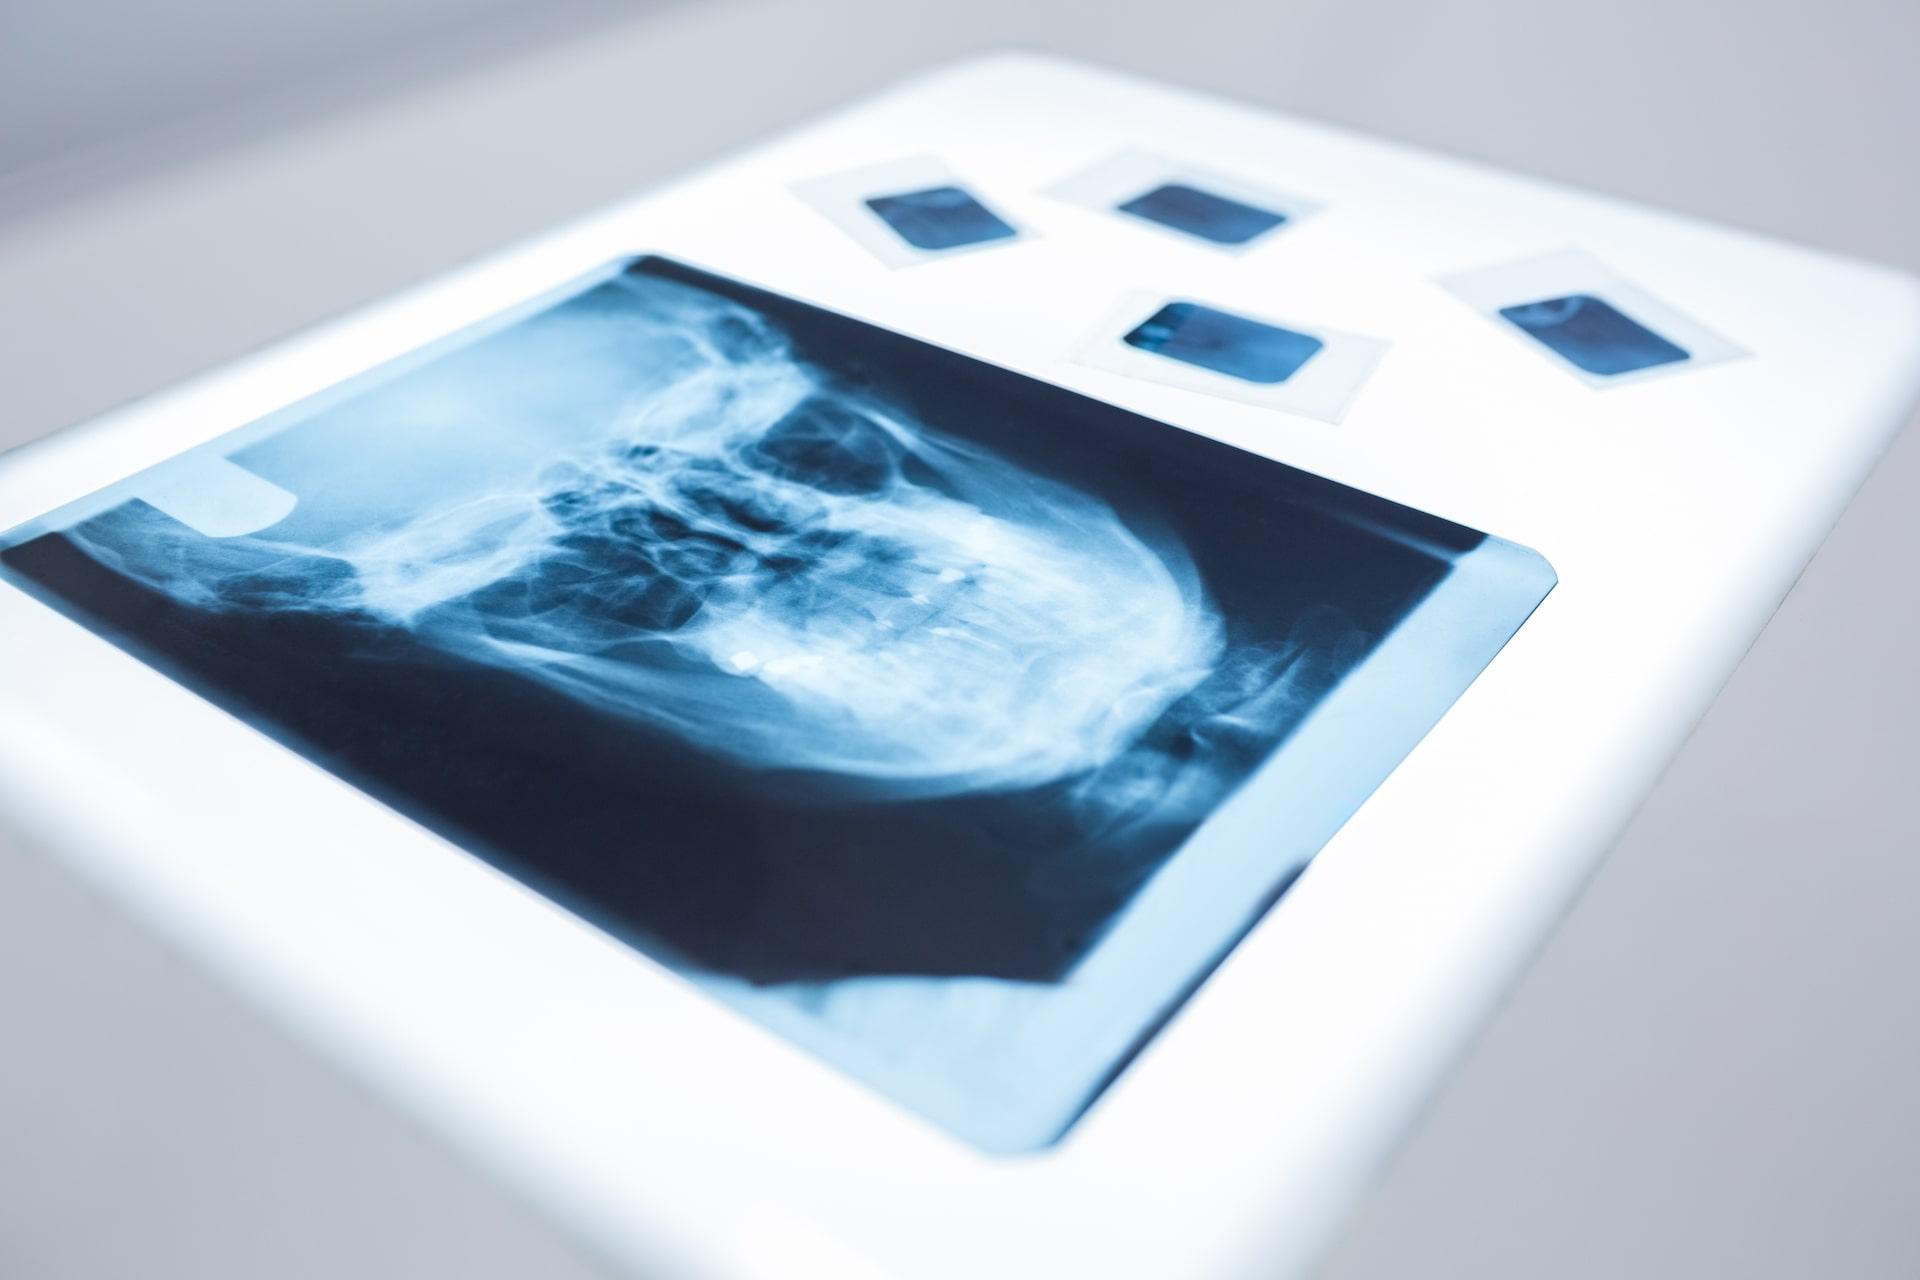 Chirofisiogen-Center-Check-up-analisi-osteoporosi-min